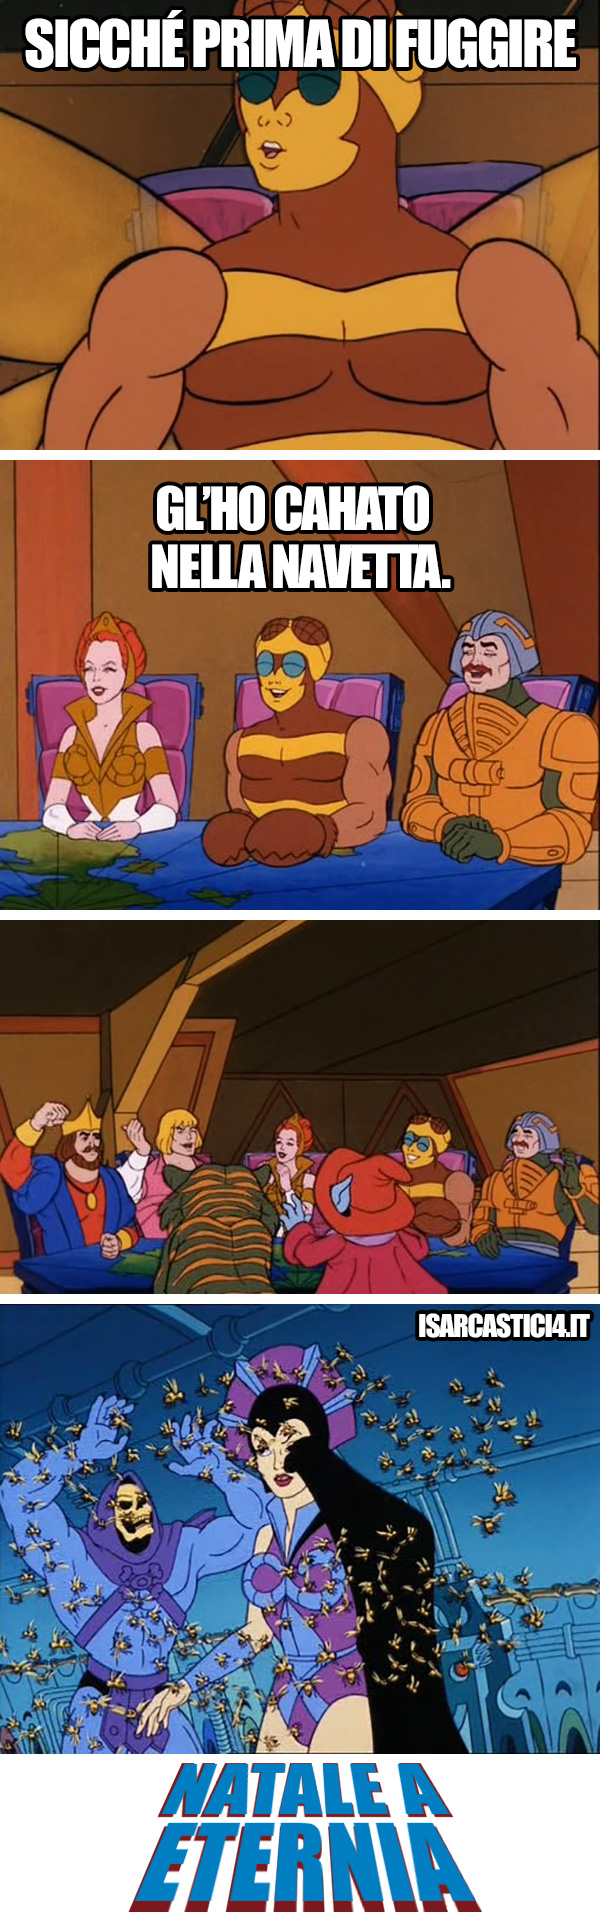 MOTU, Masters Of The Universe meme ita - I toscani hanno devastato questo paese